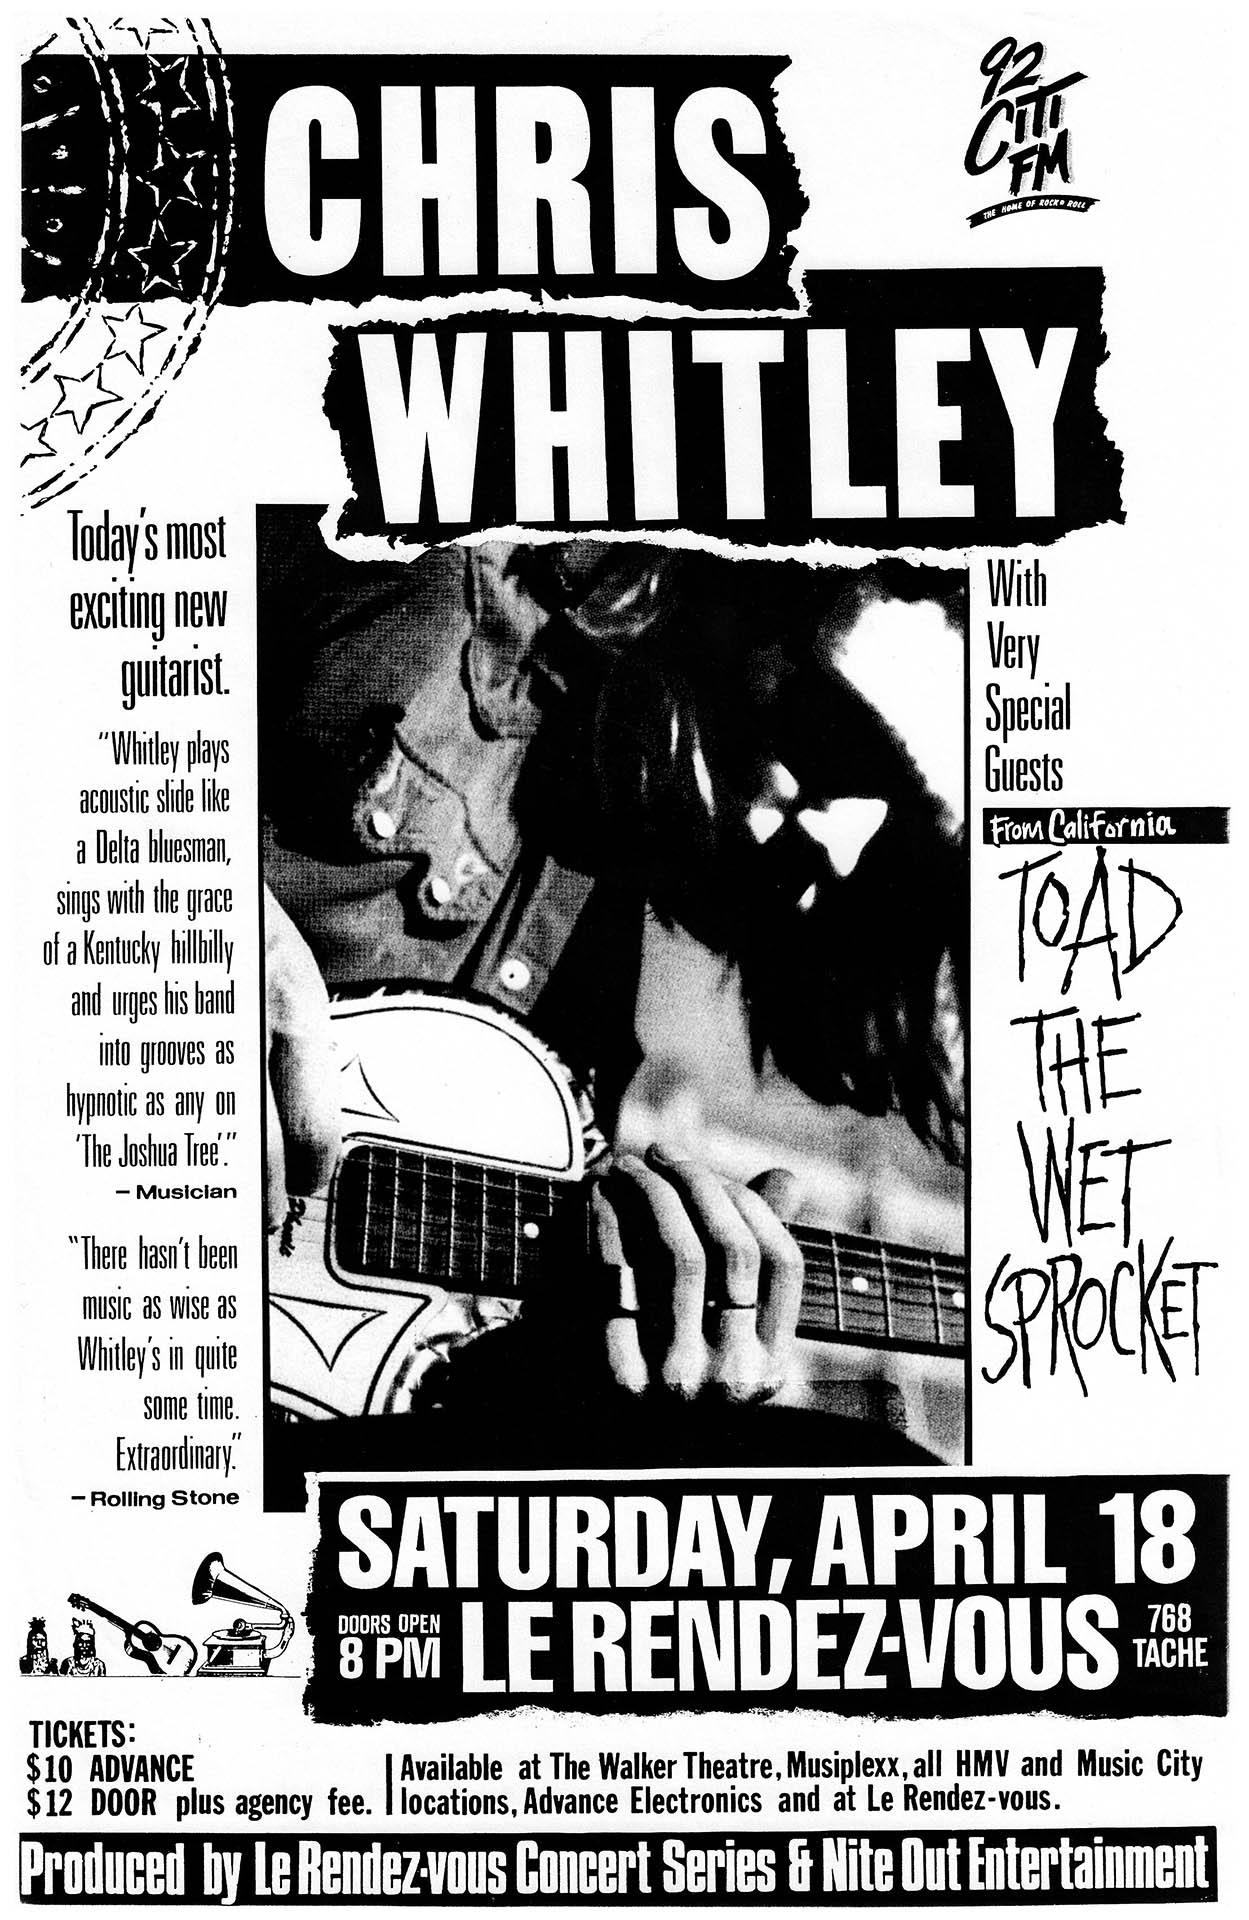 Chris Whitley - 1992